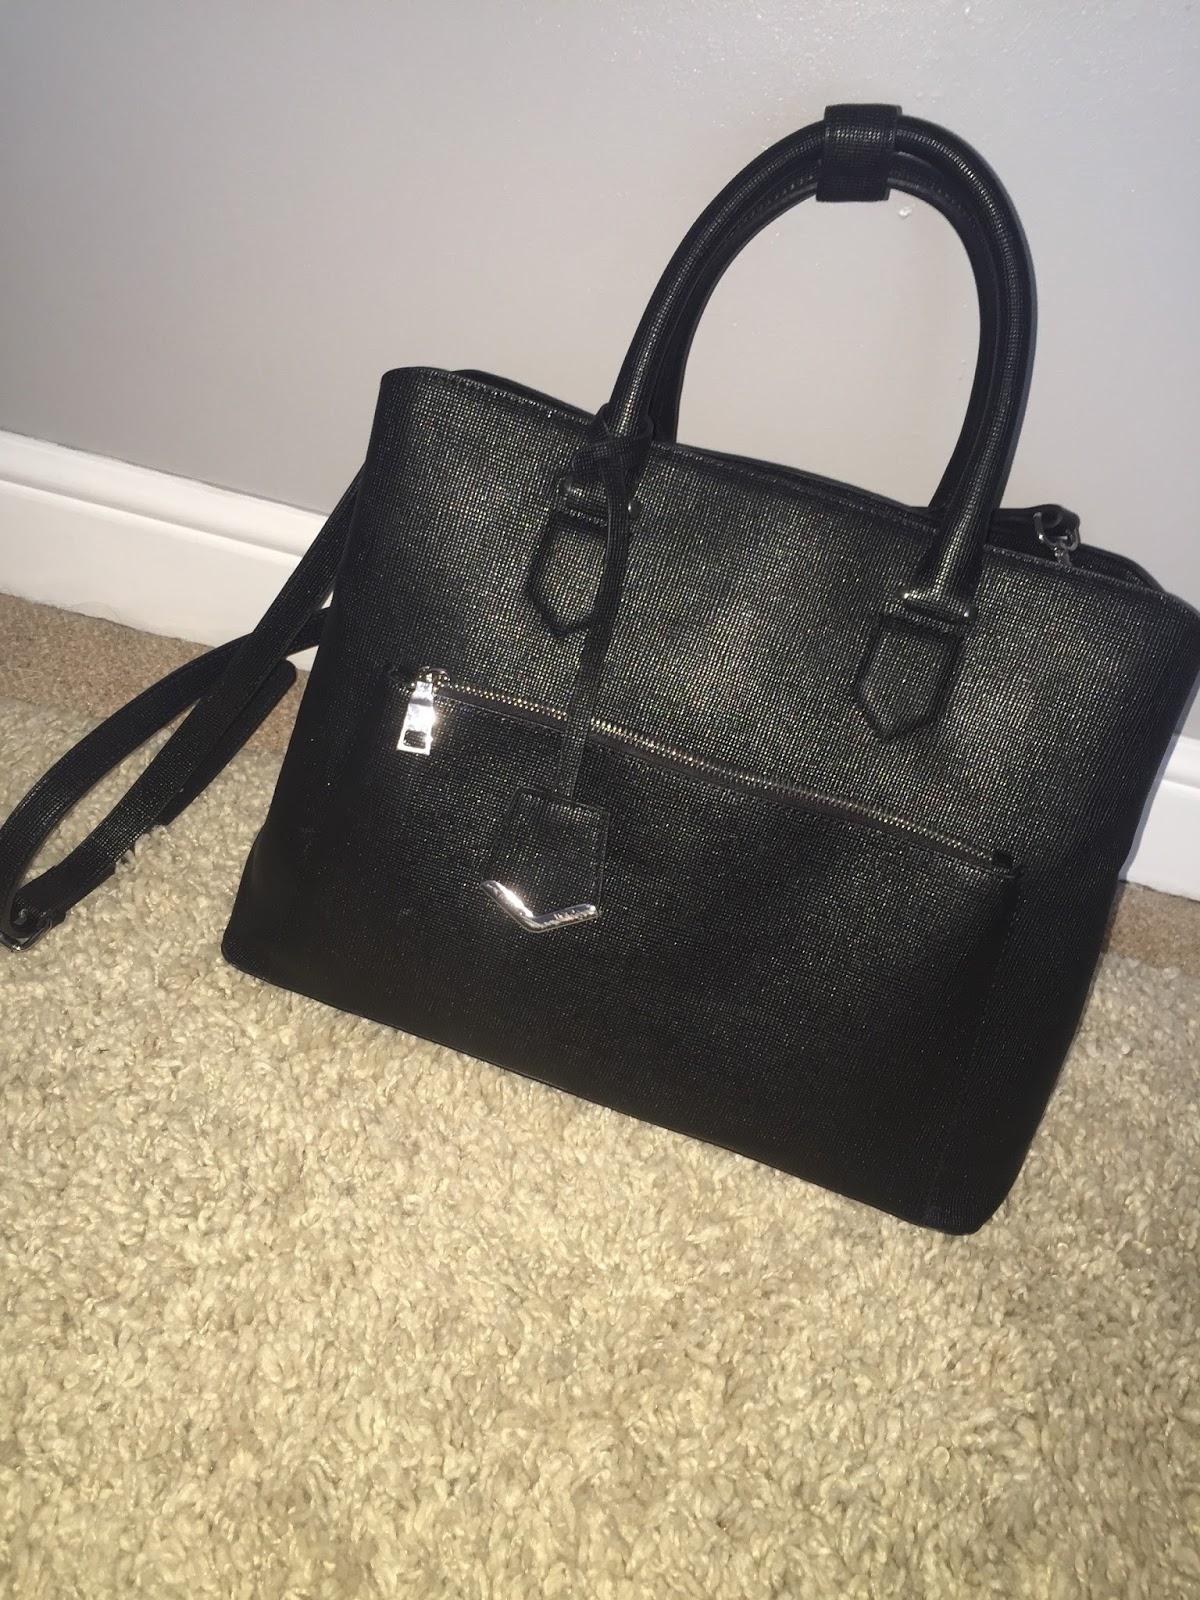 1660d7f1f9c Zara Office City Bag Review: November 2015